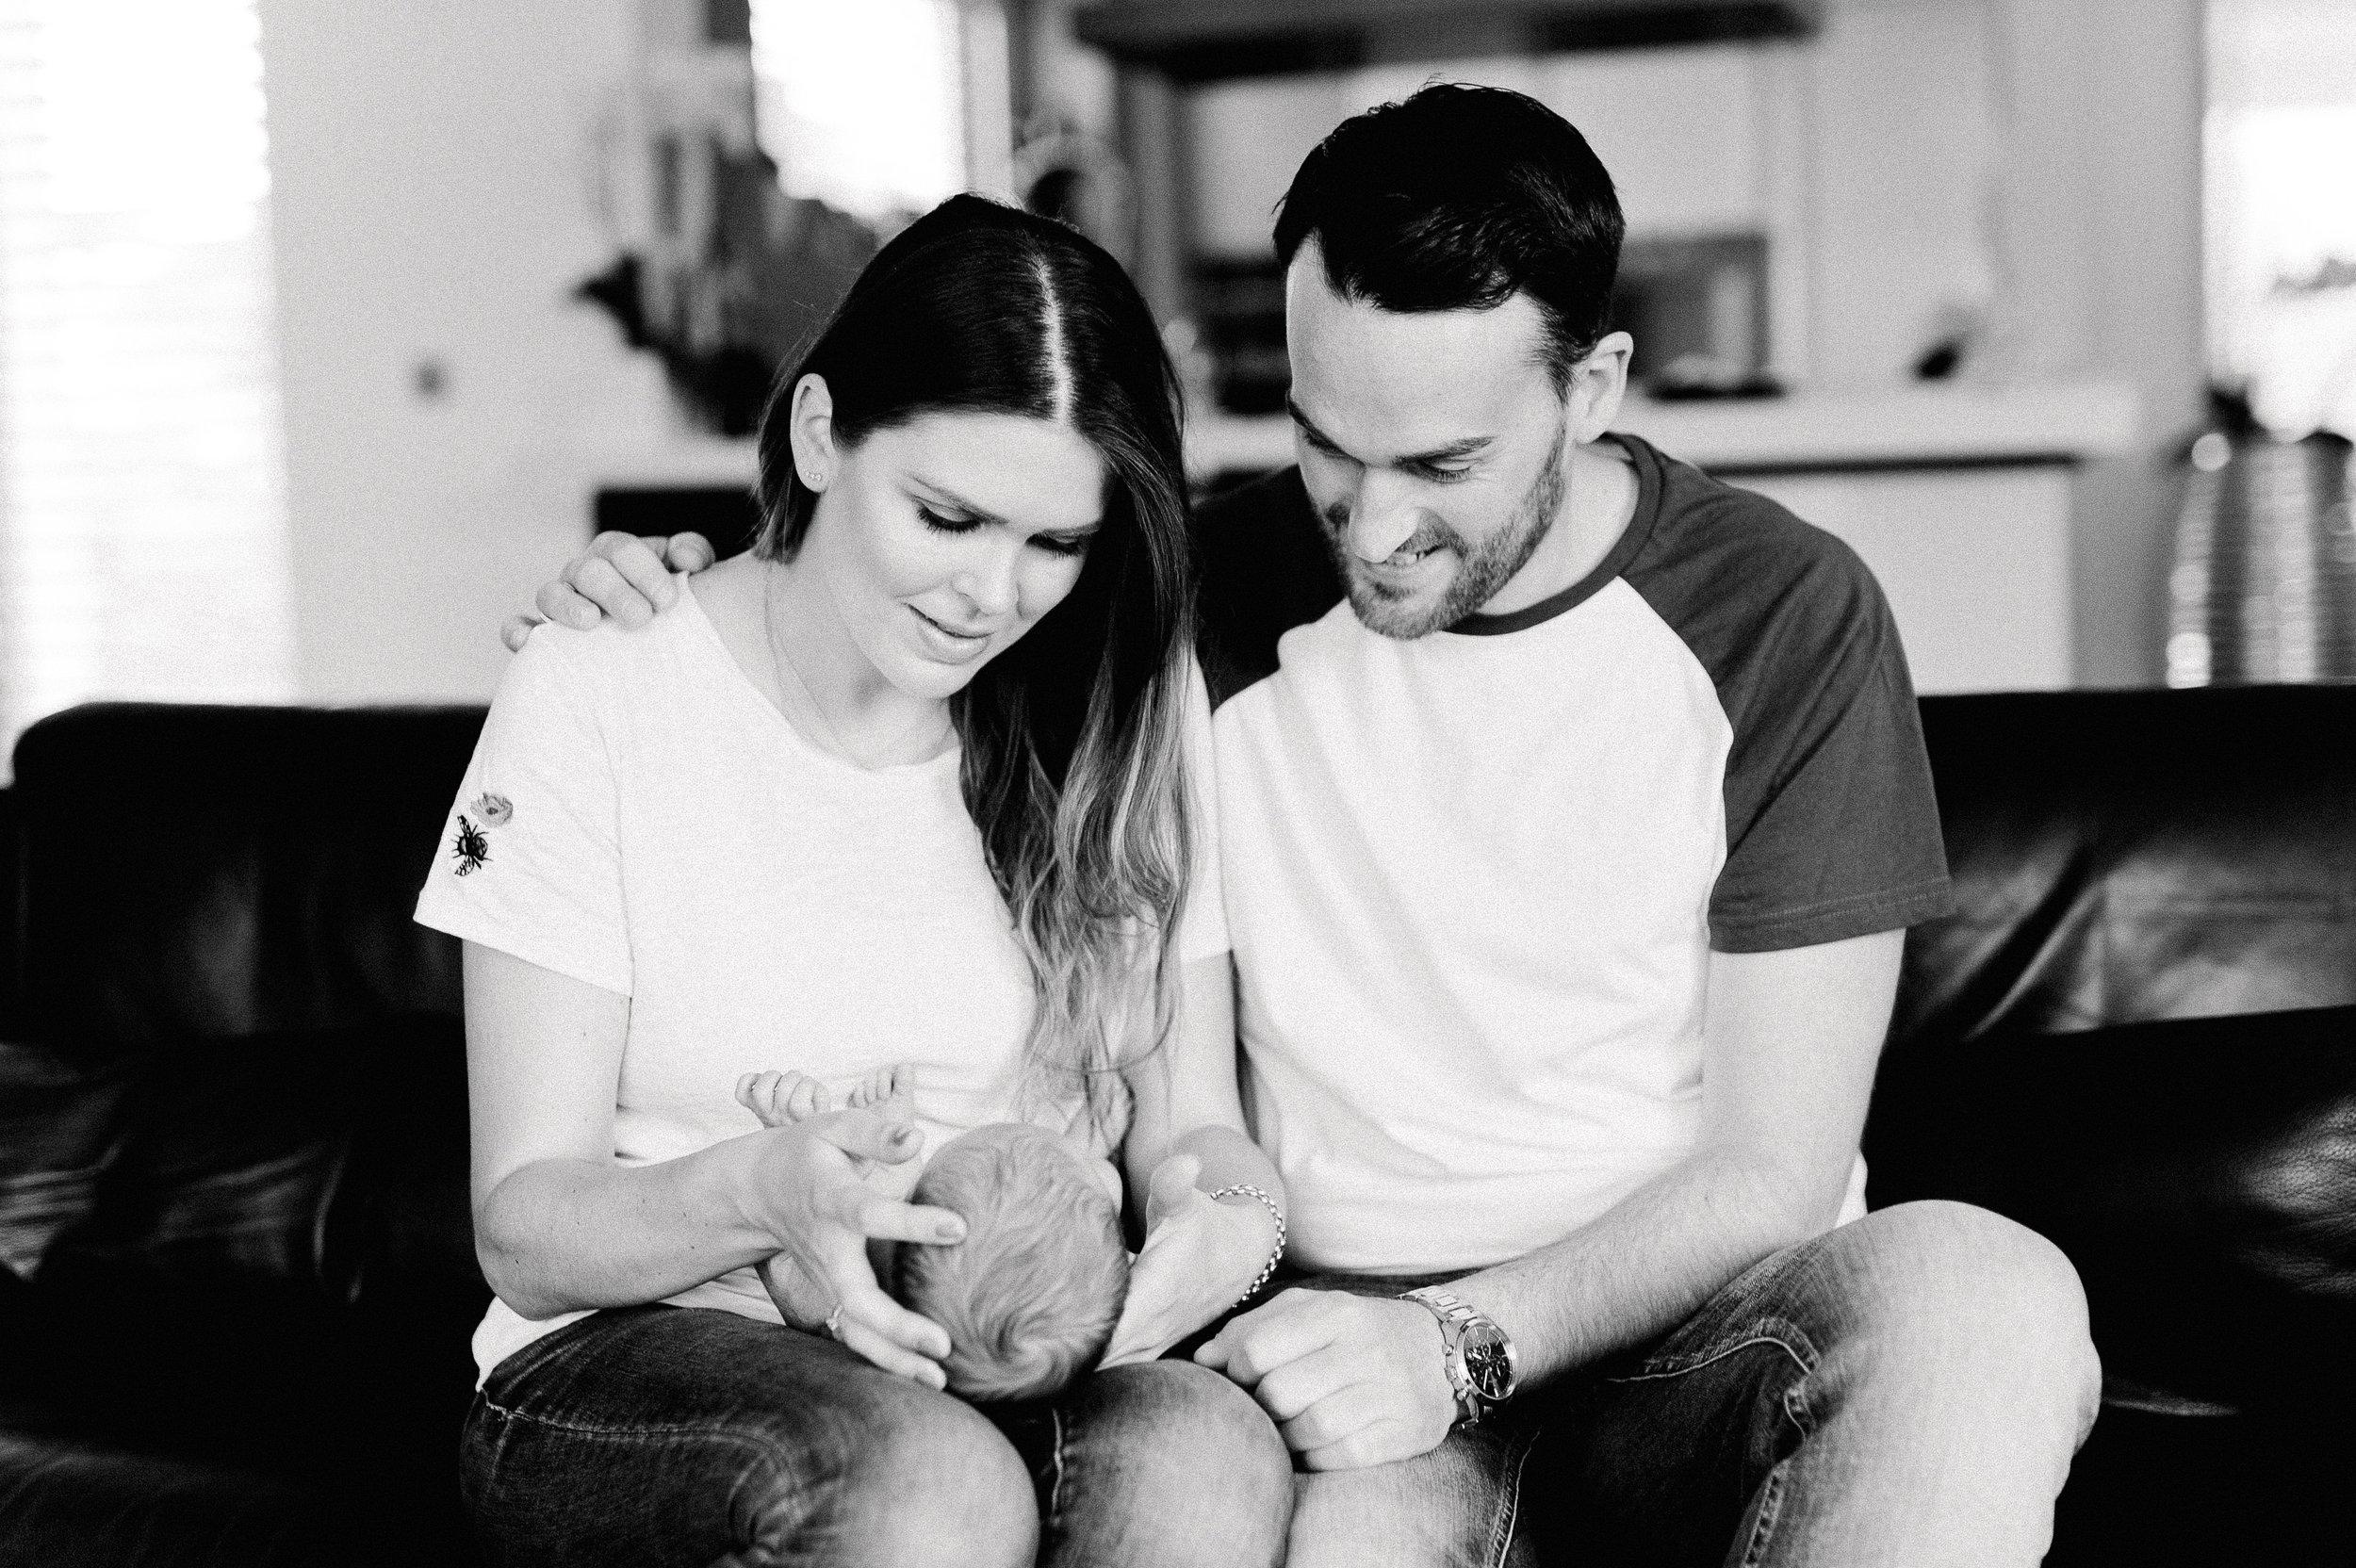 Anna-Hari-Photography-Familienshooting-Neugeborenenshooting-Mannheim-Heidelberg2.jpg